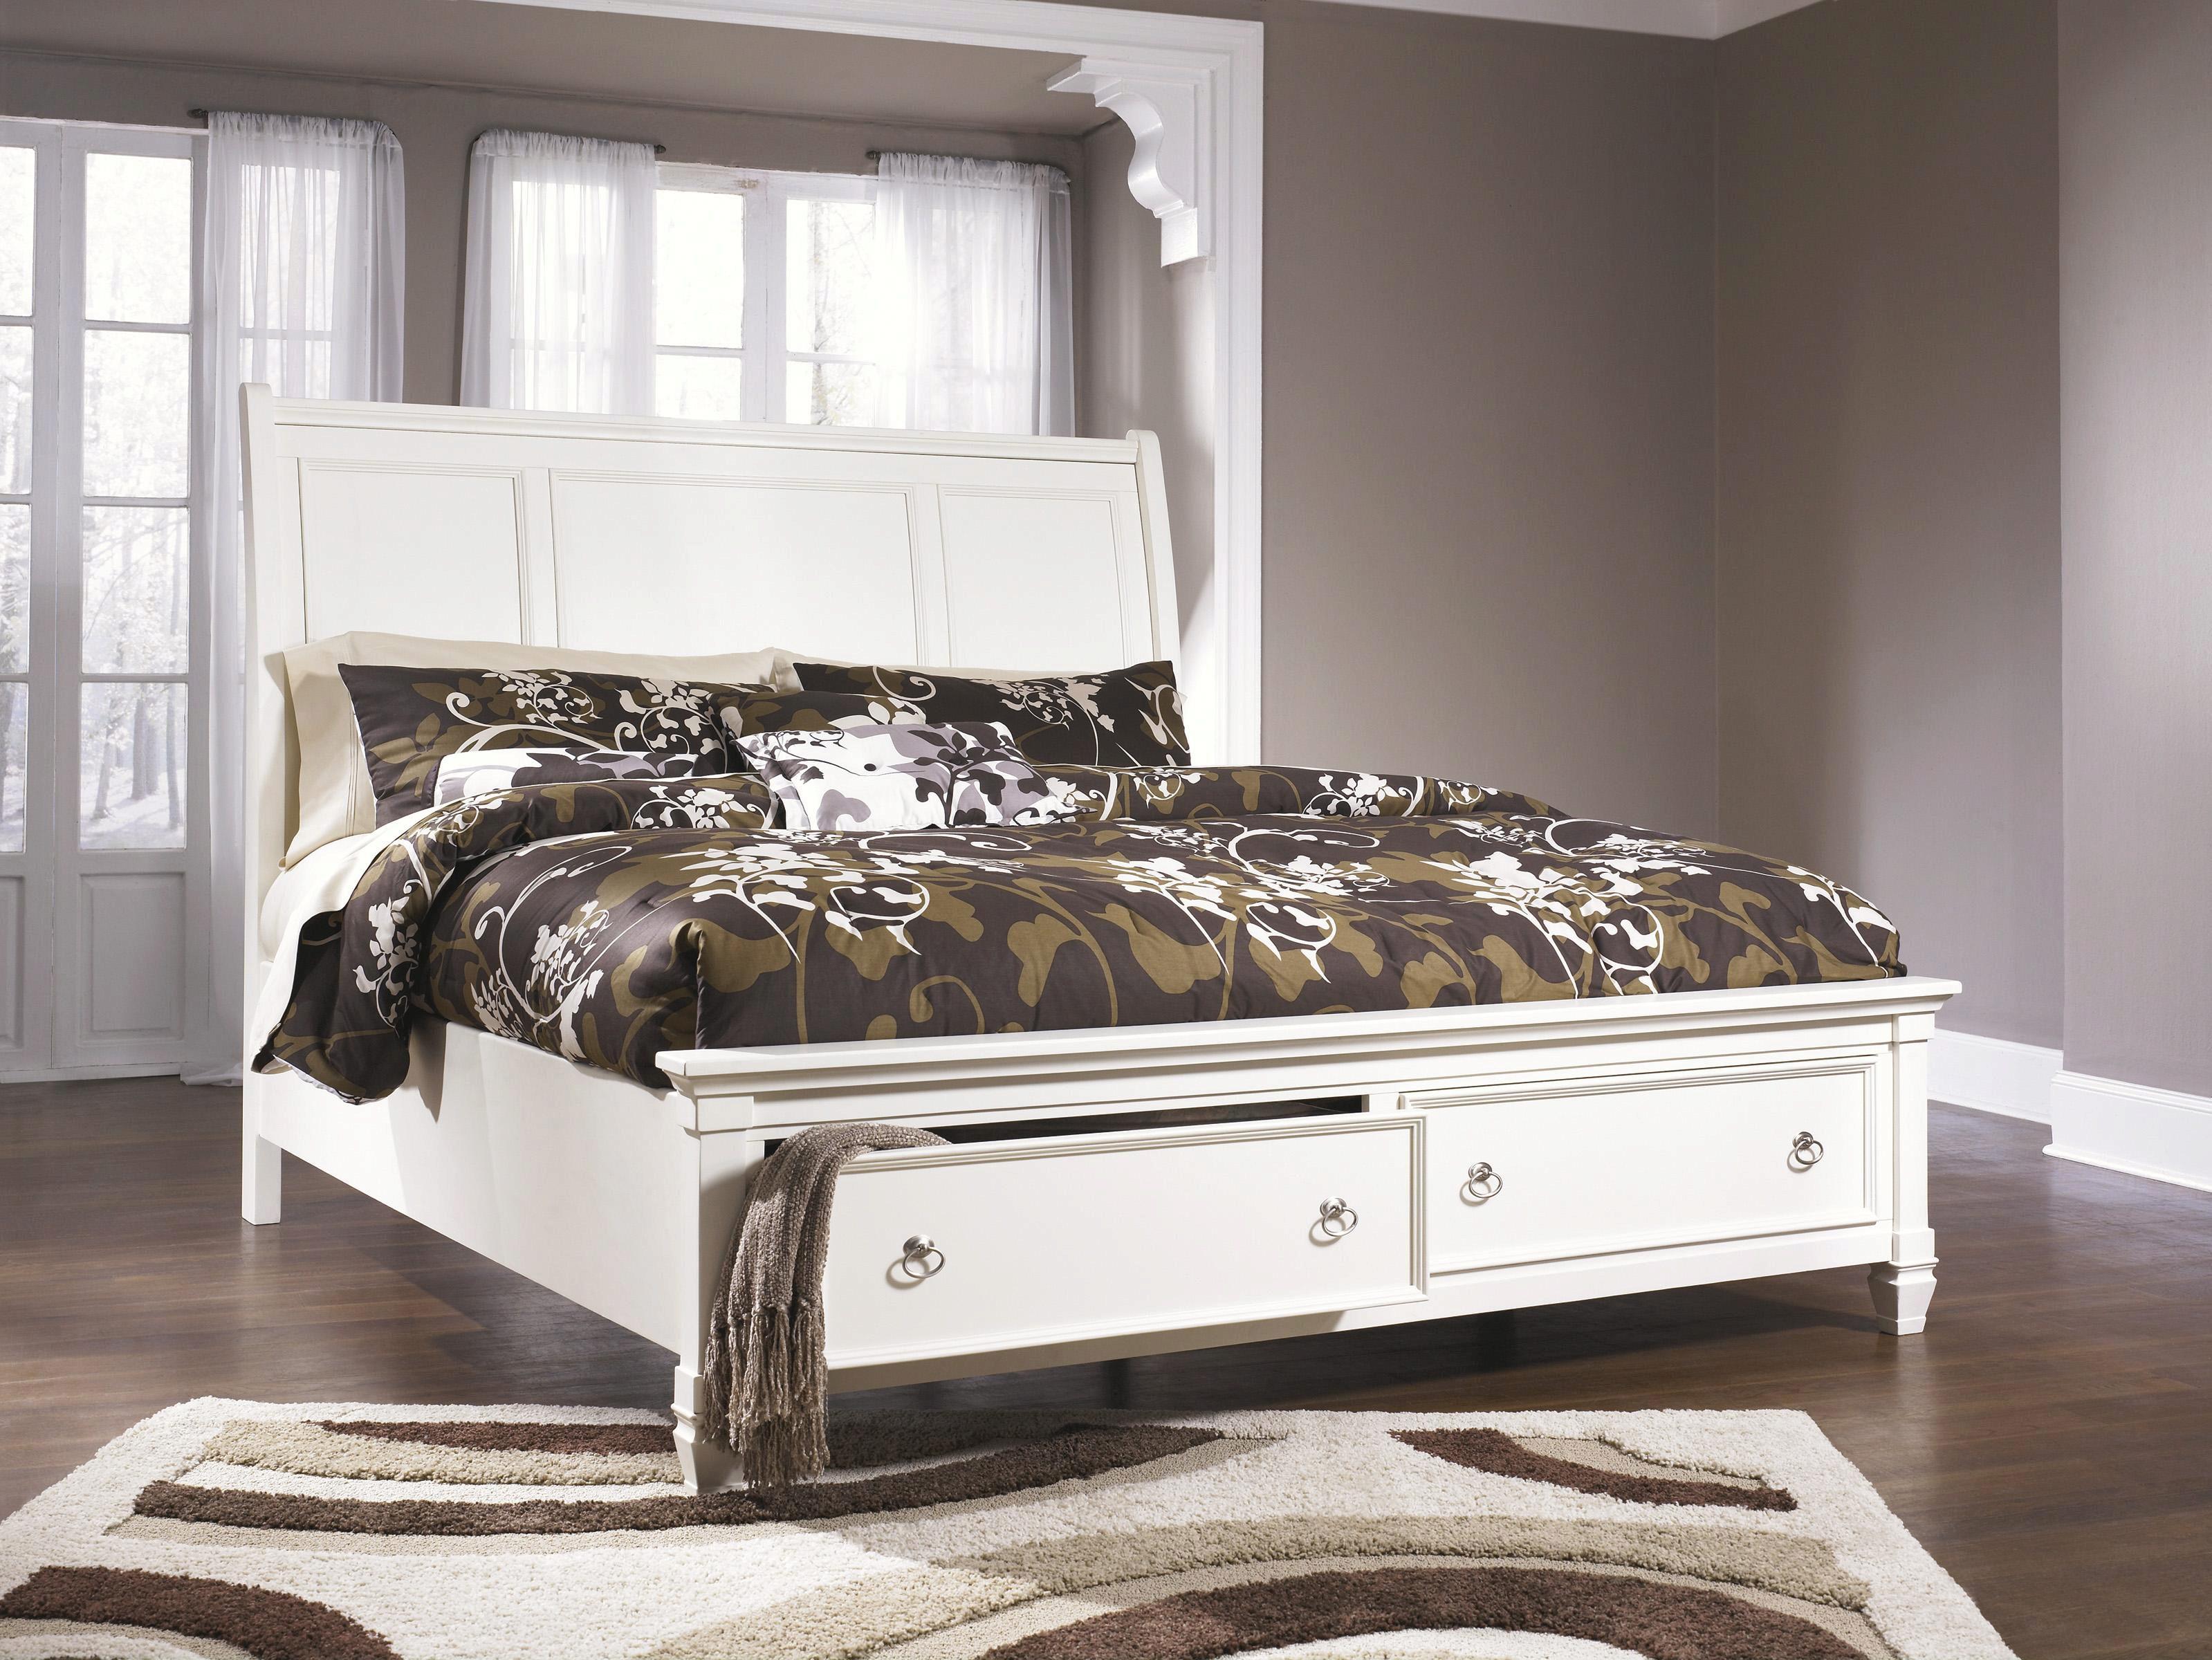 Ashley Prentice B672 King Size Sleigh Bedroom Set 5pcs In White B672 31 36 46 78 76 99 93 Set 5